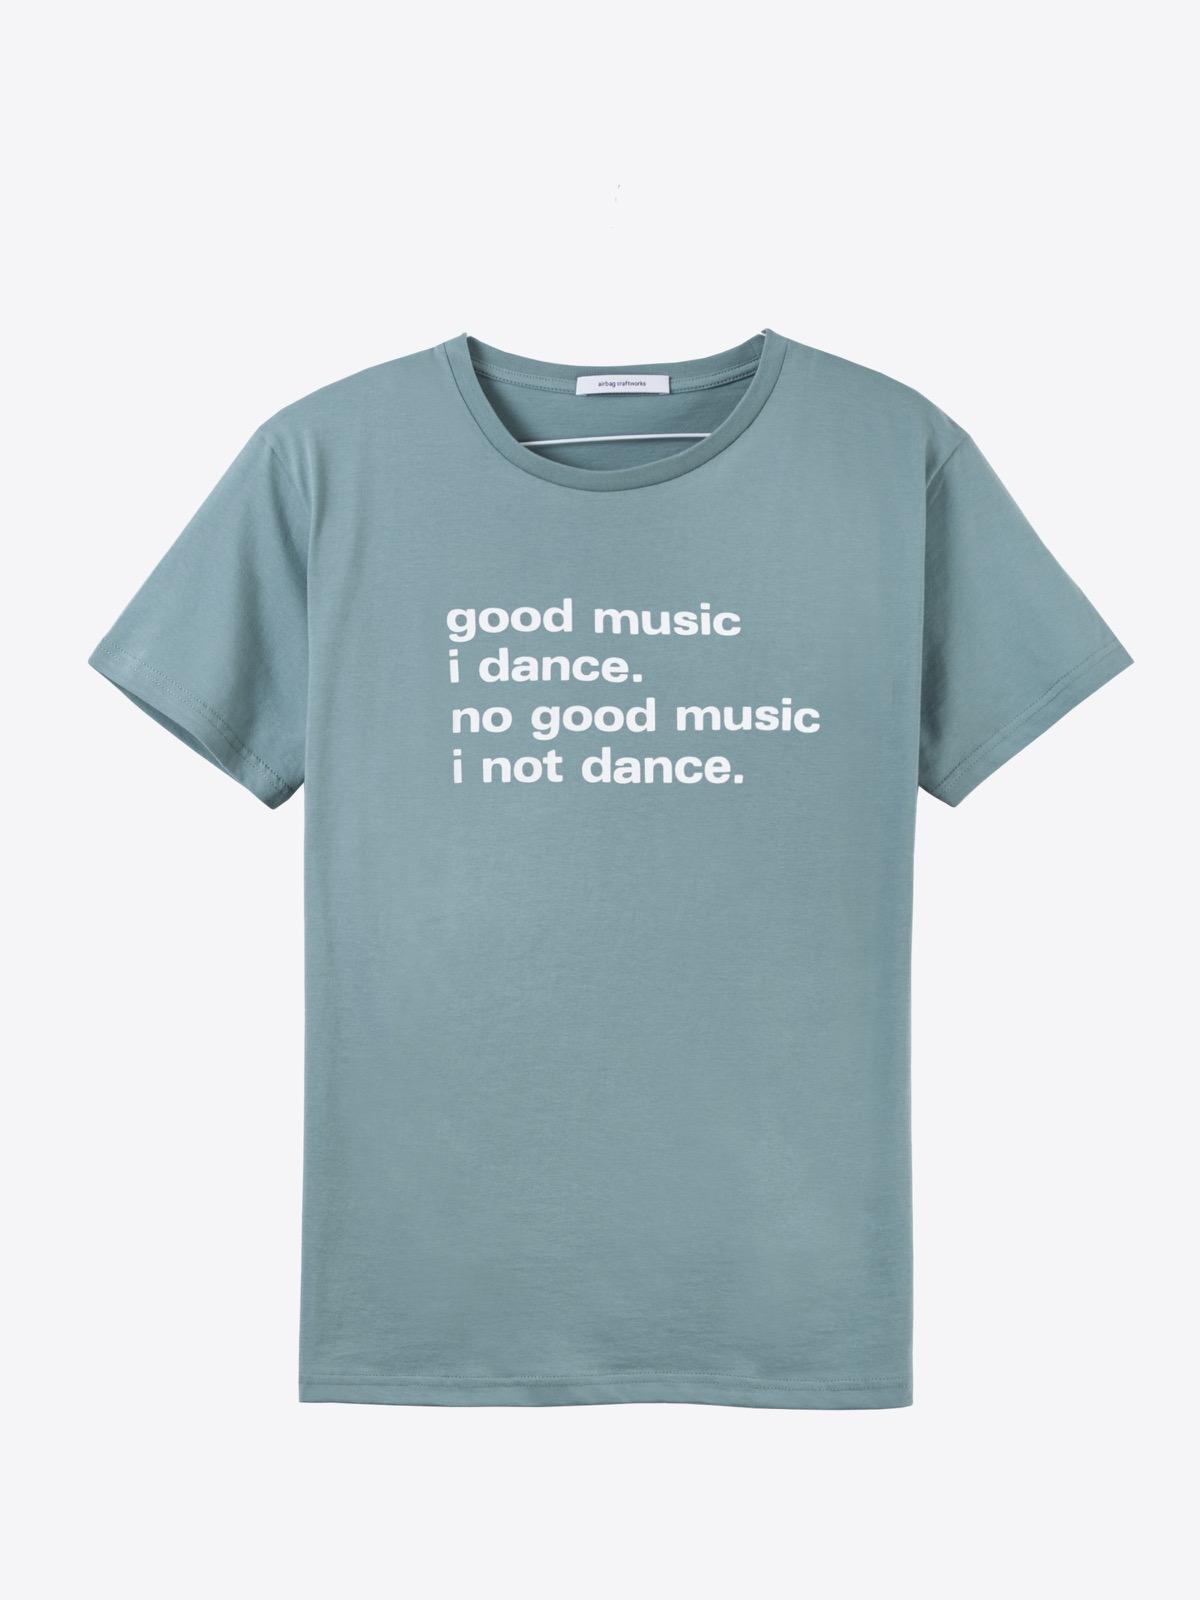 airbag craftworks good music i dance | mint grey